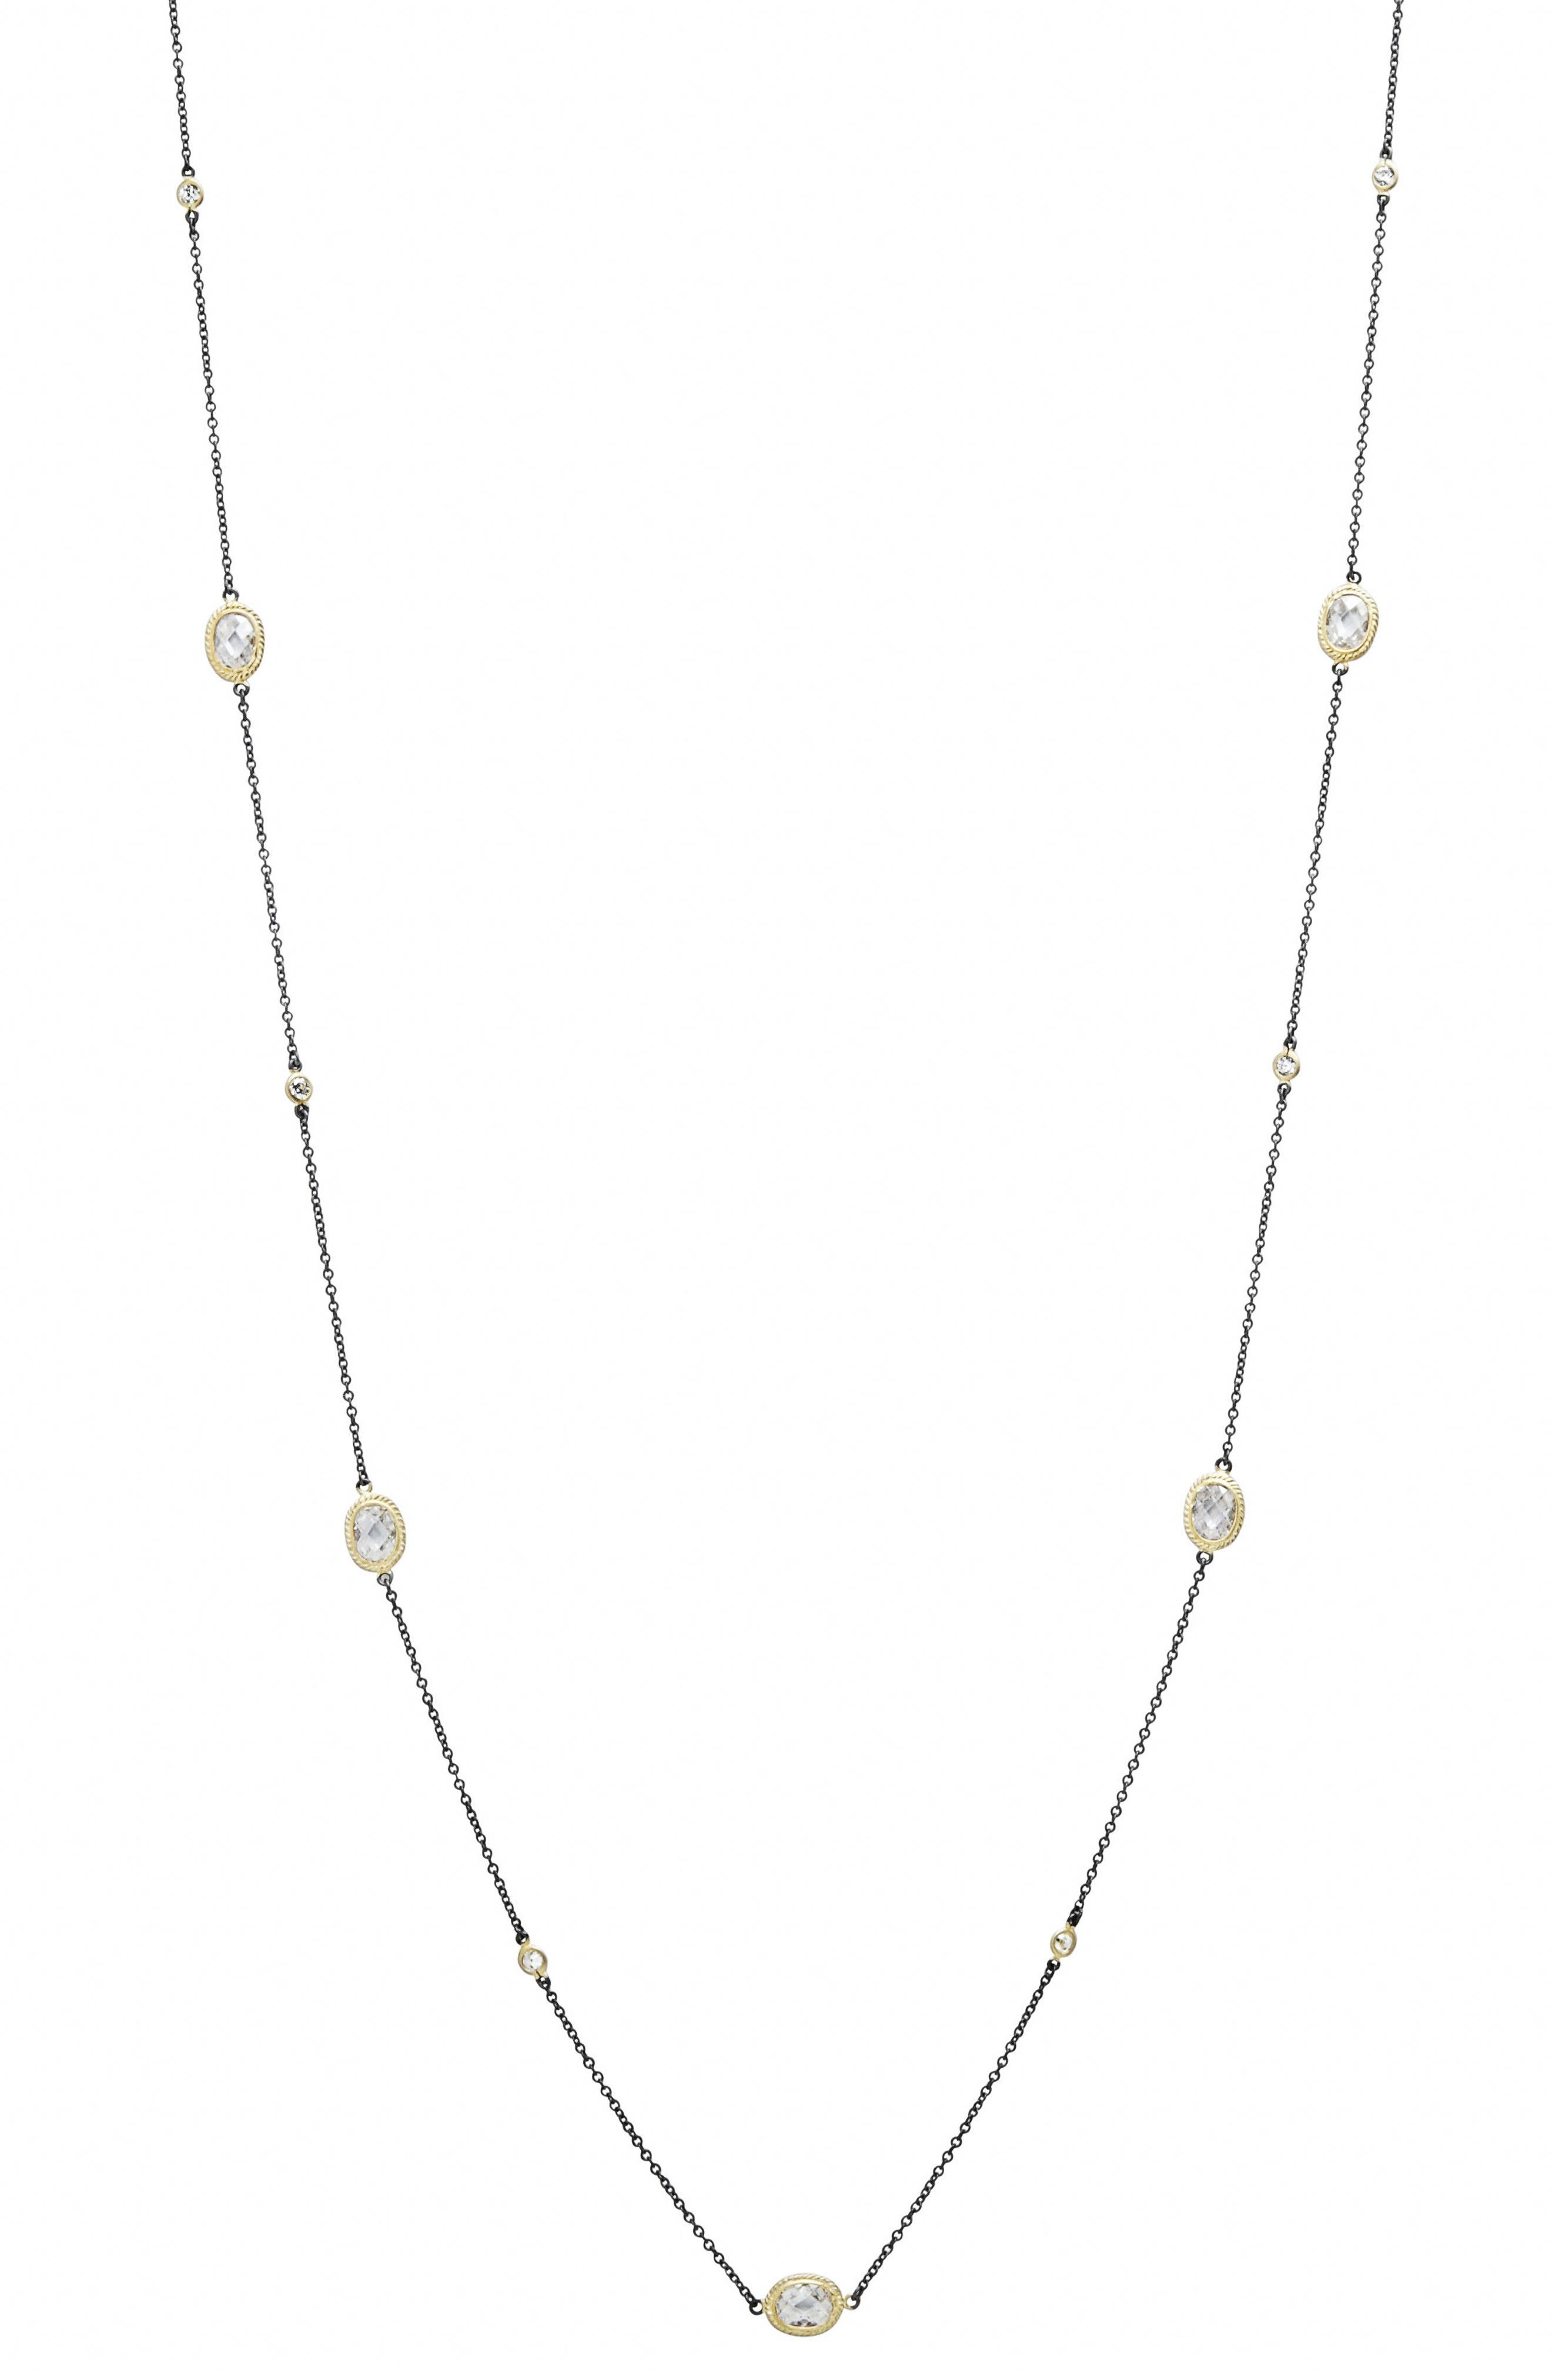 Signature Radiance Wrap Necklace,                         Main,                         color, Gold/ Black